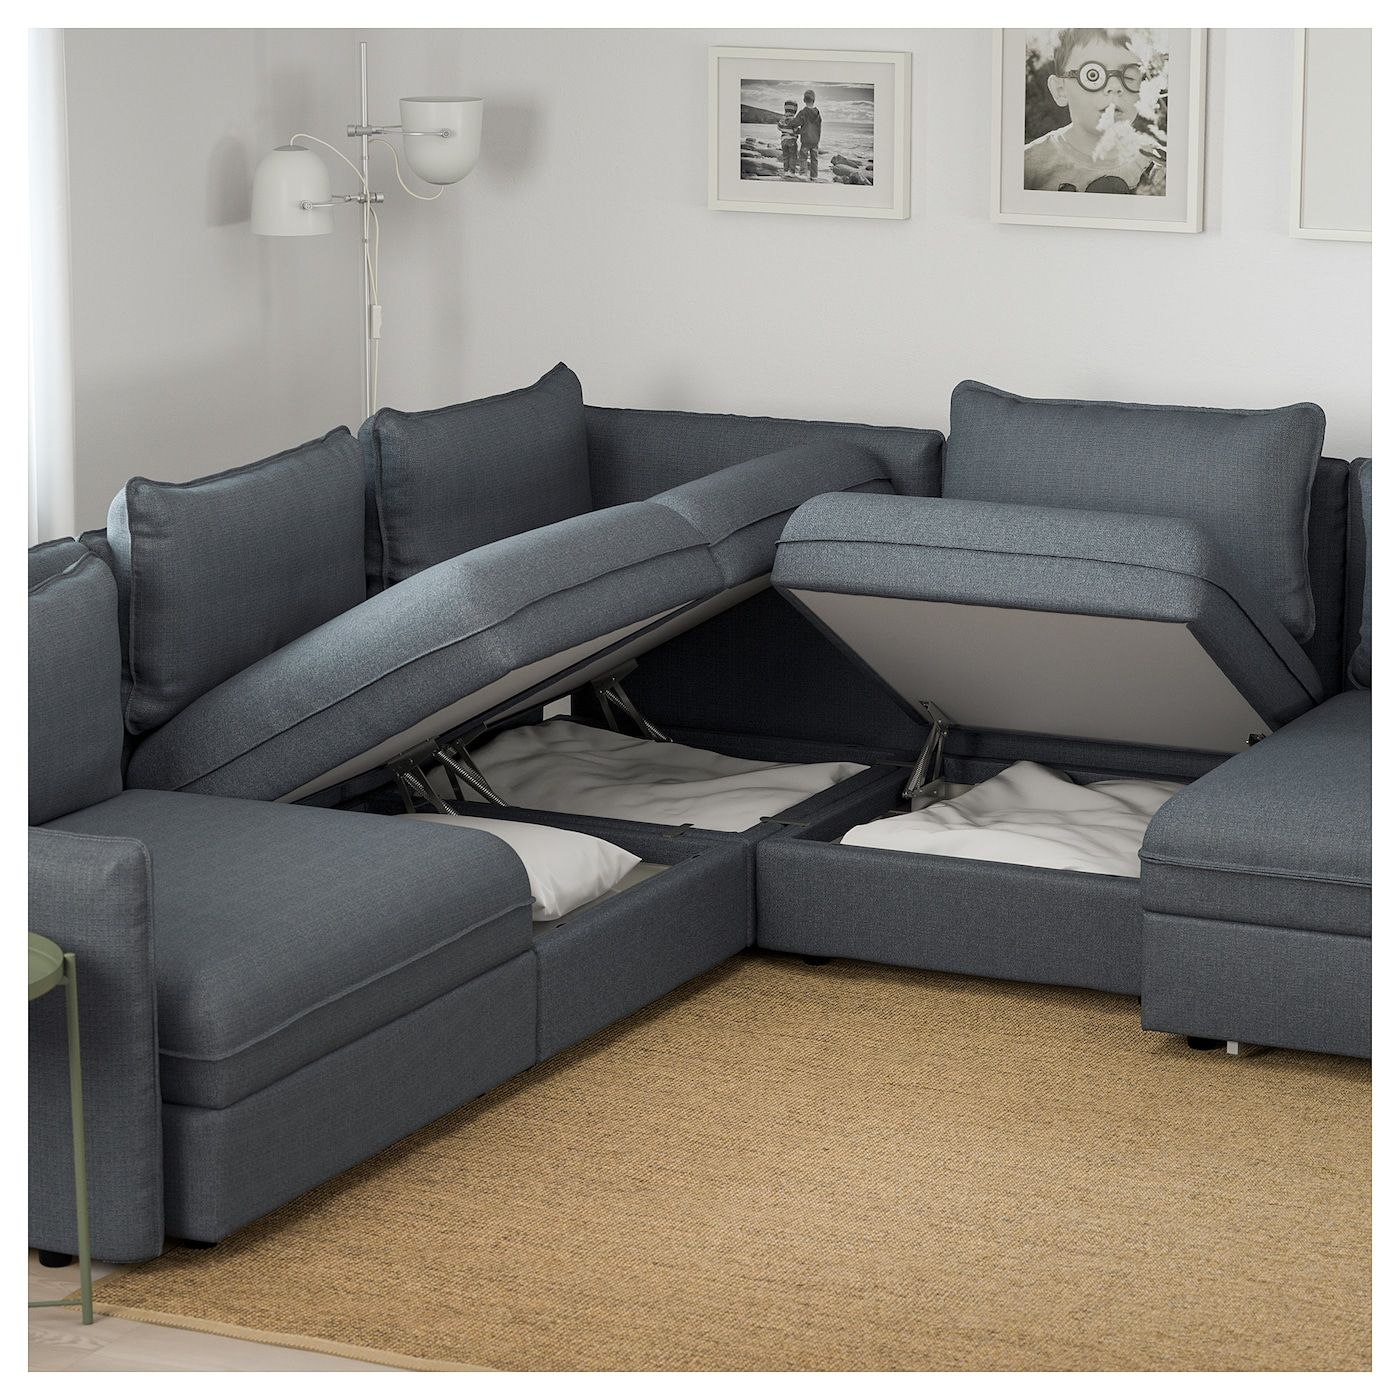 Us Furniture And Home Furnishings Ikea L Shaped Sofa Bed